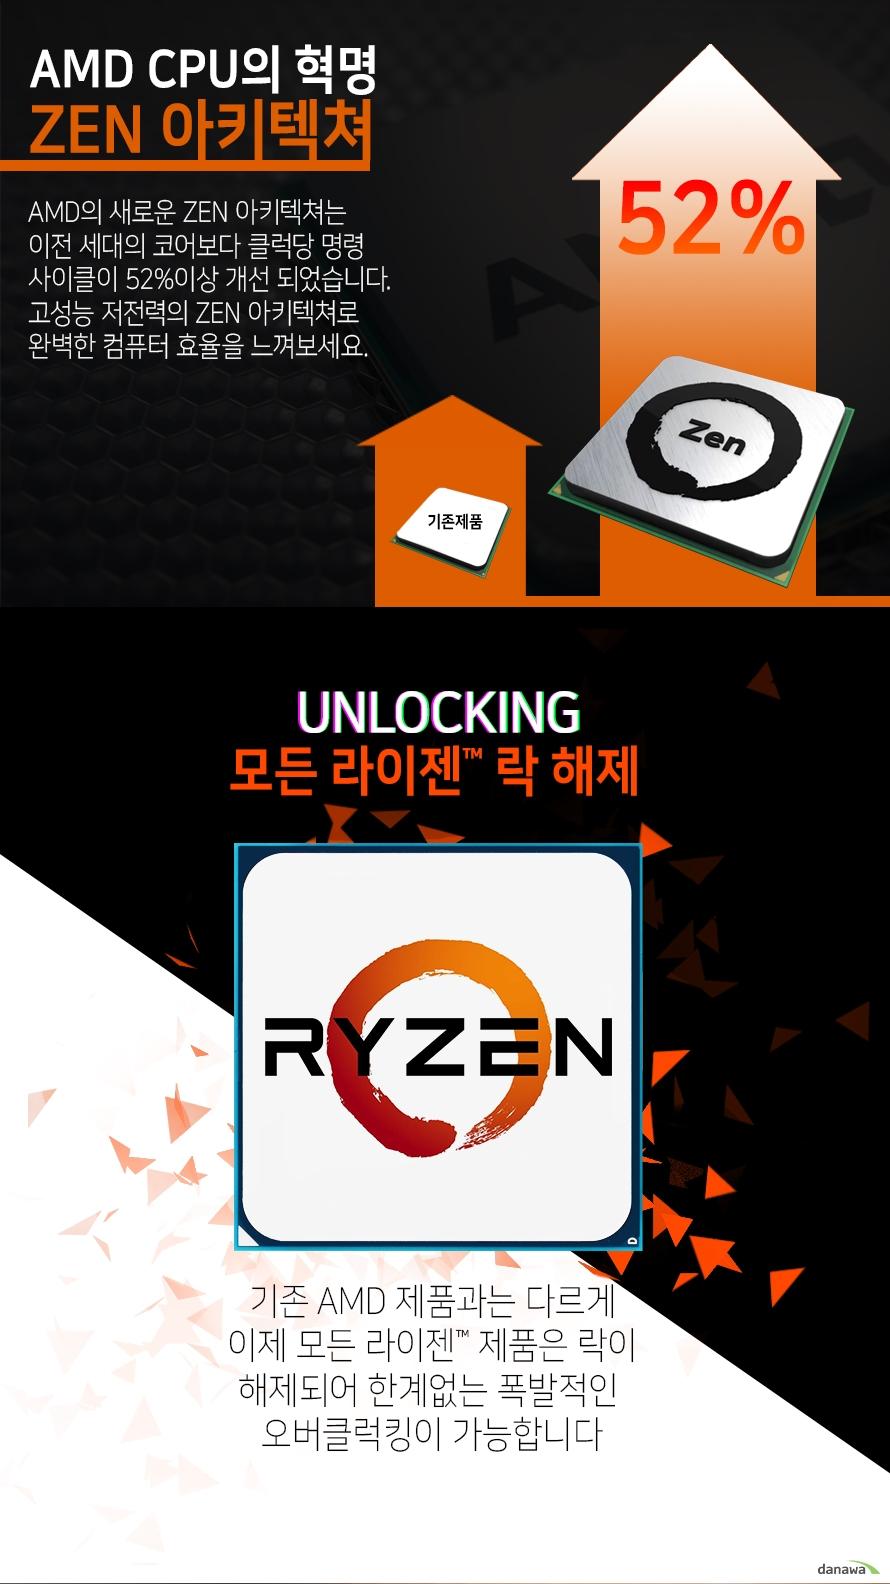 AMD CPU의 혁명          ZEN 아키텍쳐                    AMD의 새로운 ZEN 아키텍쳐는 이전 세대의 코어보다           클럭당 명령 사이클이 52%이상 개선 되었습니다.          고성능 저전력 ZEN 아키텍쳐로 완벽한 컴퓨터 효율을 느껴보세요.                              UNLOCKING          모든 라이젠 락 해제          기존 AMD 제품과는 다르게 이제 모든 라이젠 제품은          락이 해제되어 한계없는 폭발적인 오버클럭킹이 가능합니다.